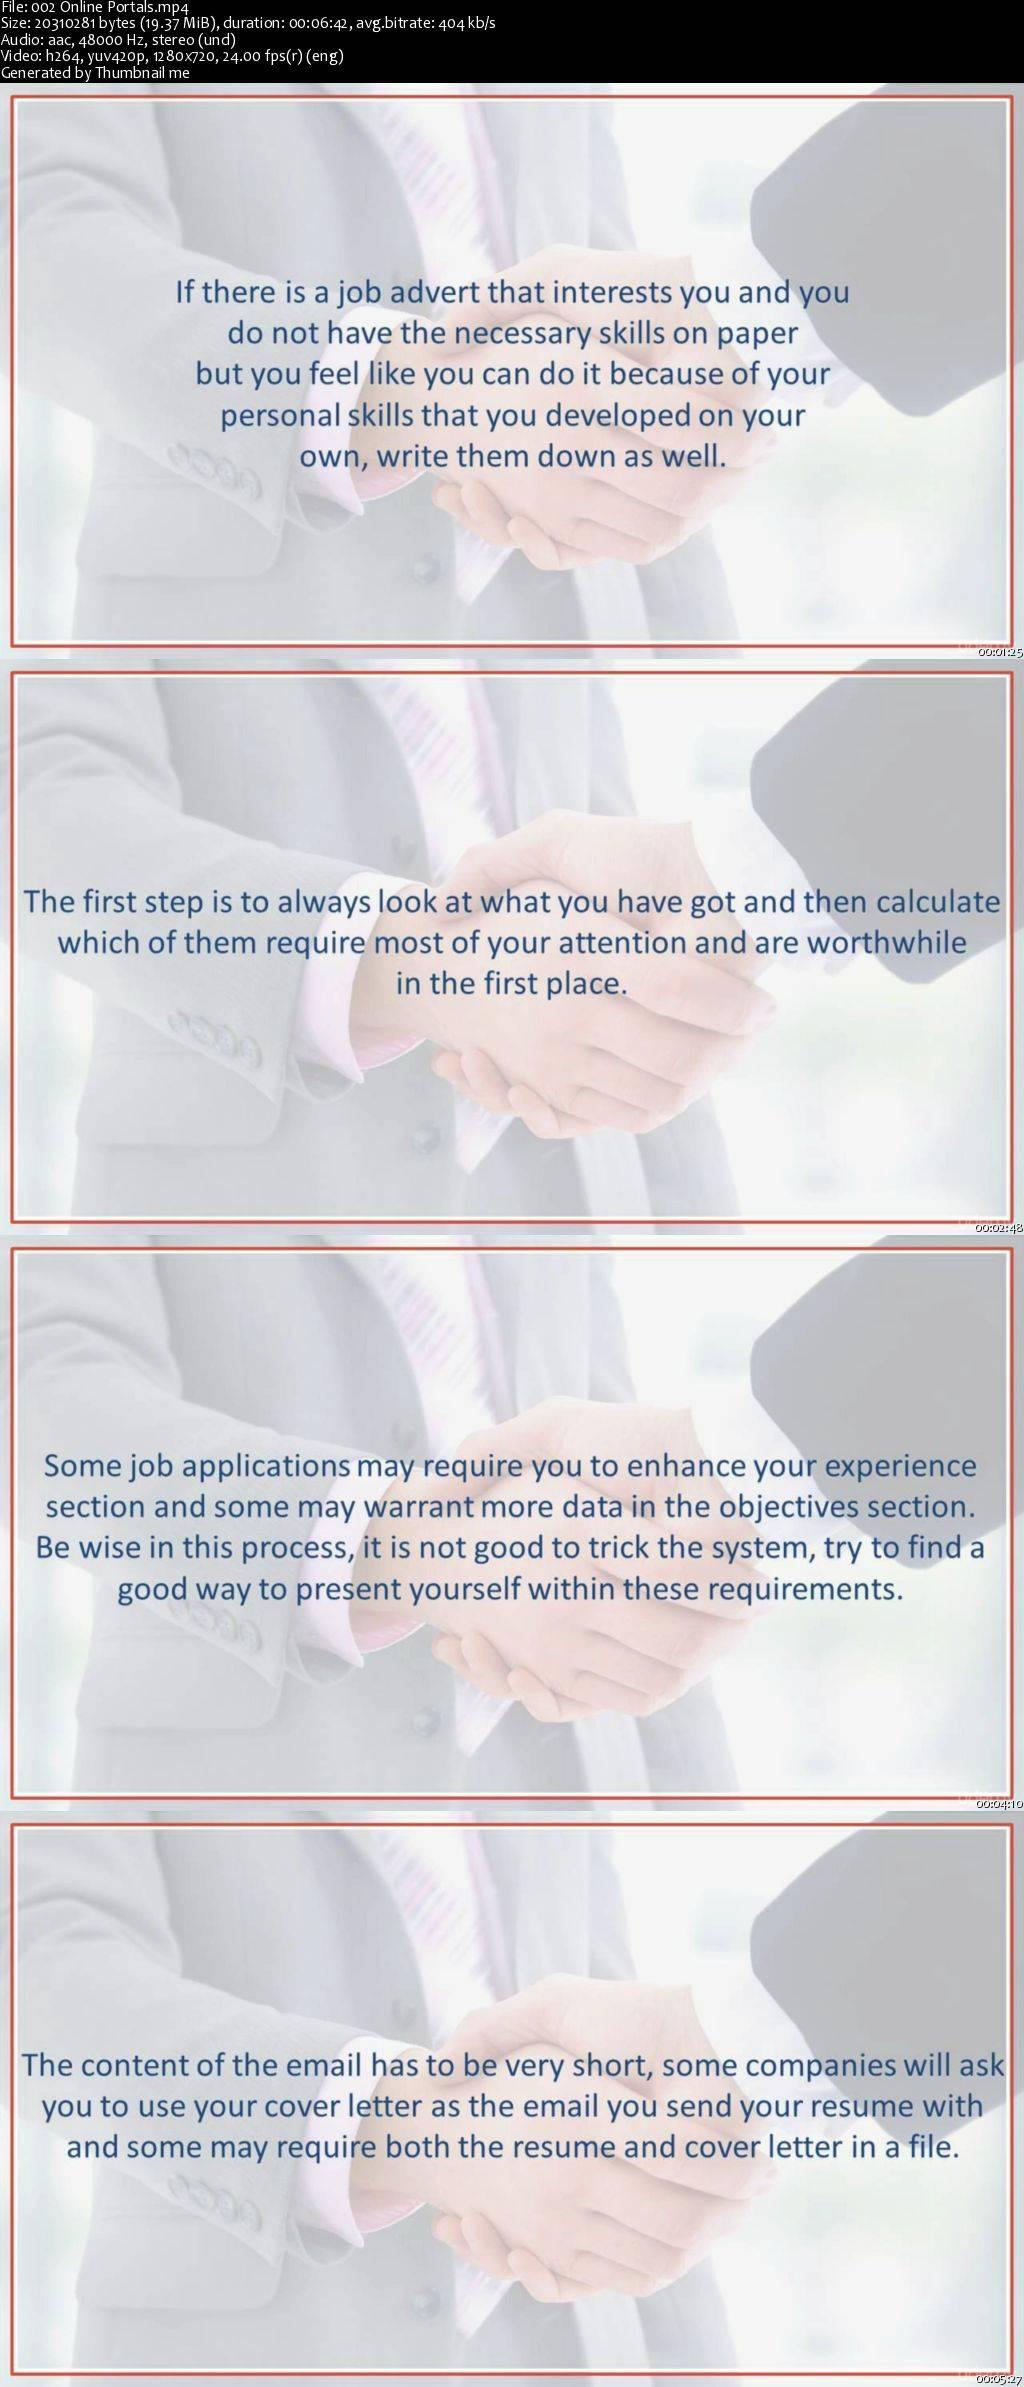 Interviewing skills & Job search: Resume writing, LinkedIn / AvaxHome